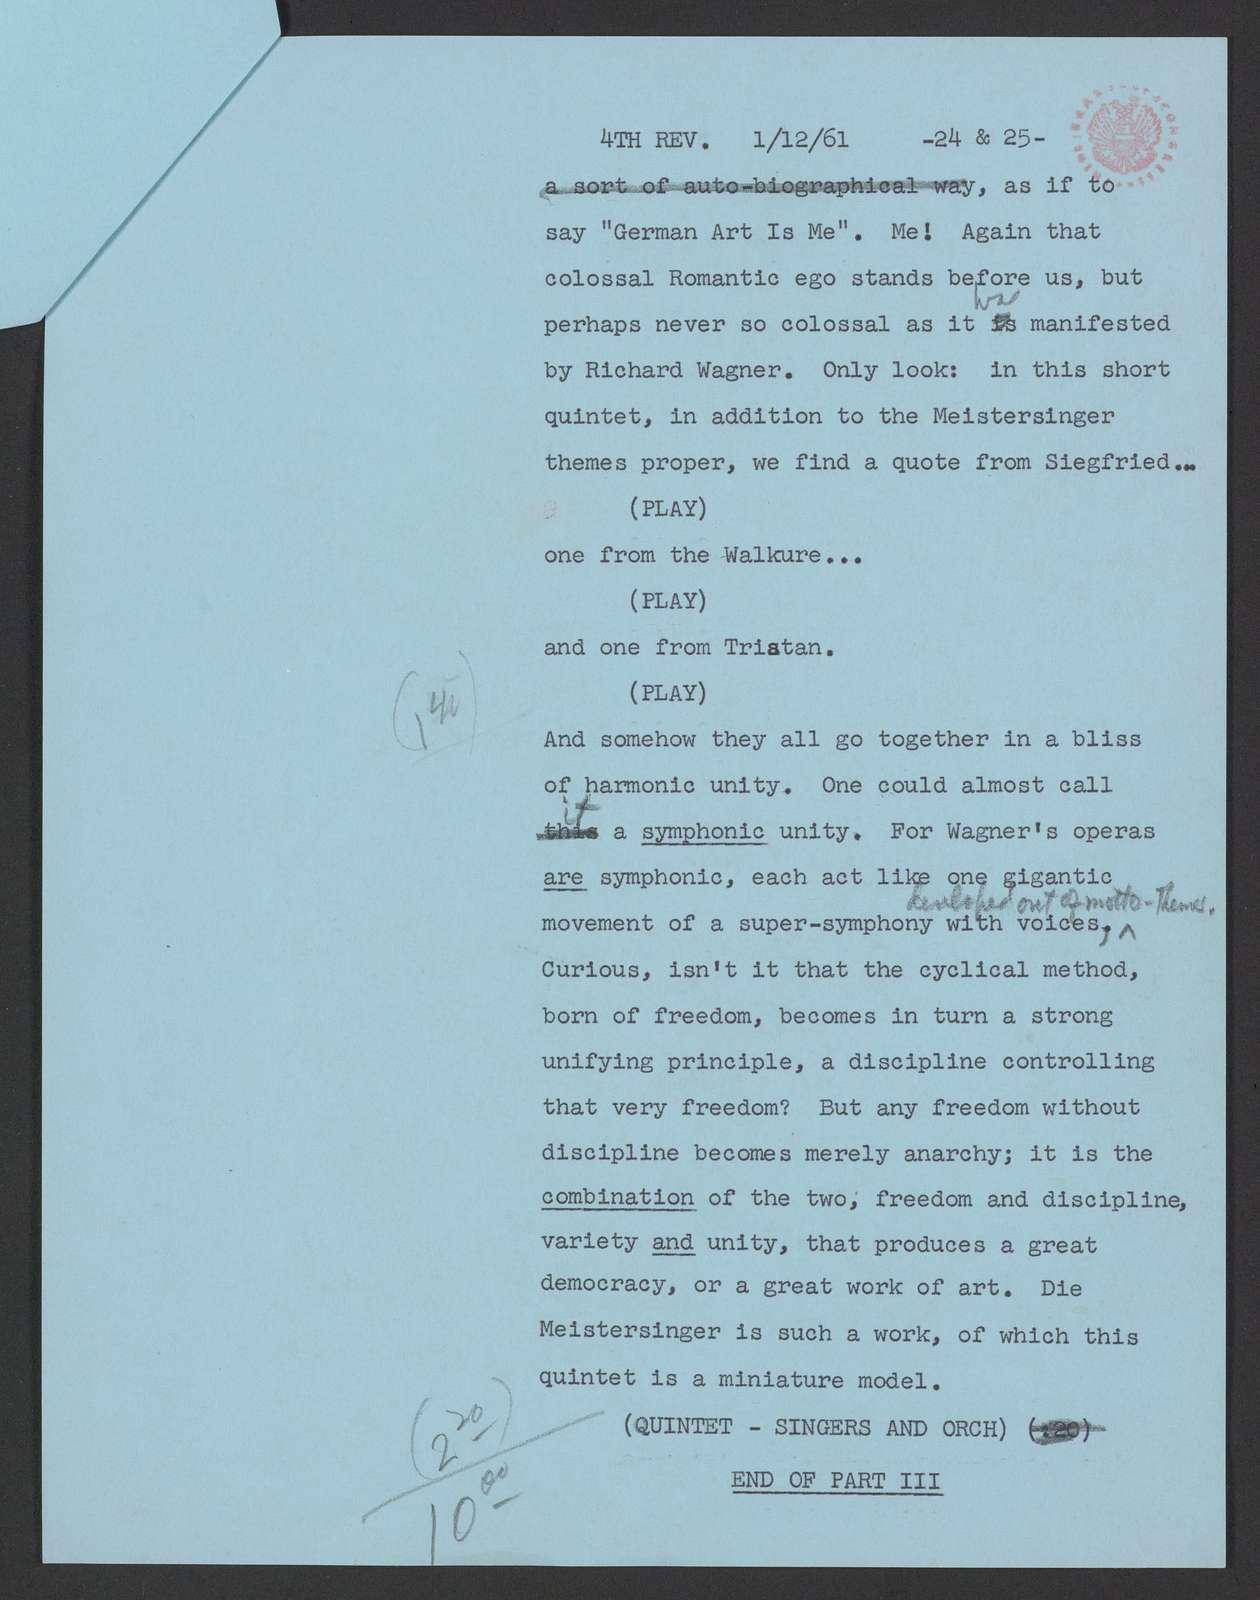 Romanticism in music TV script, Ford Presents, 1961 Jan. 22